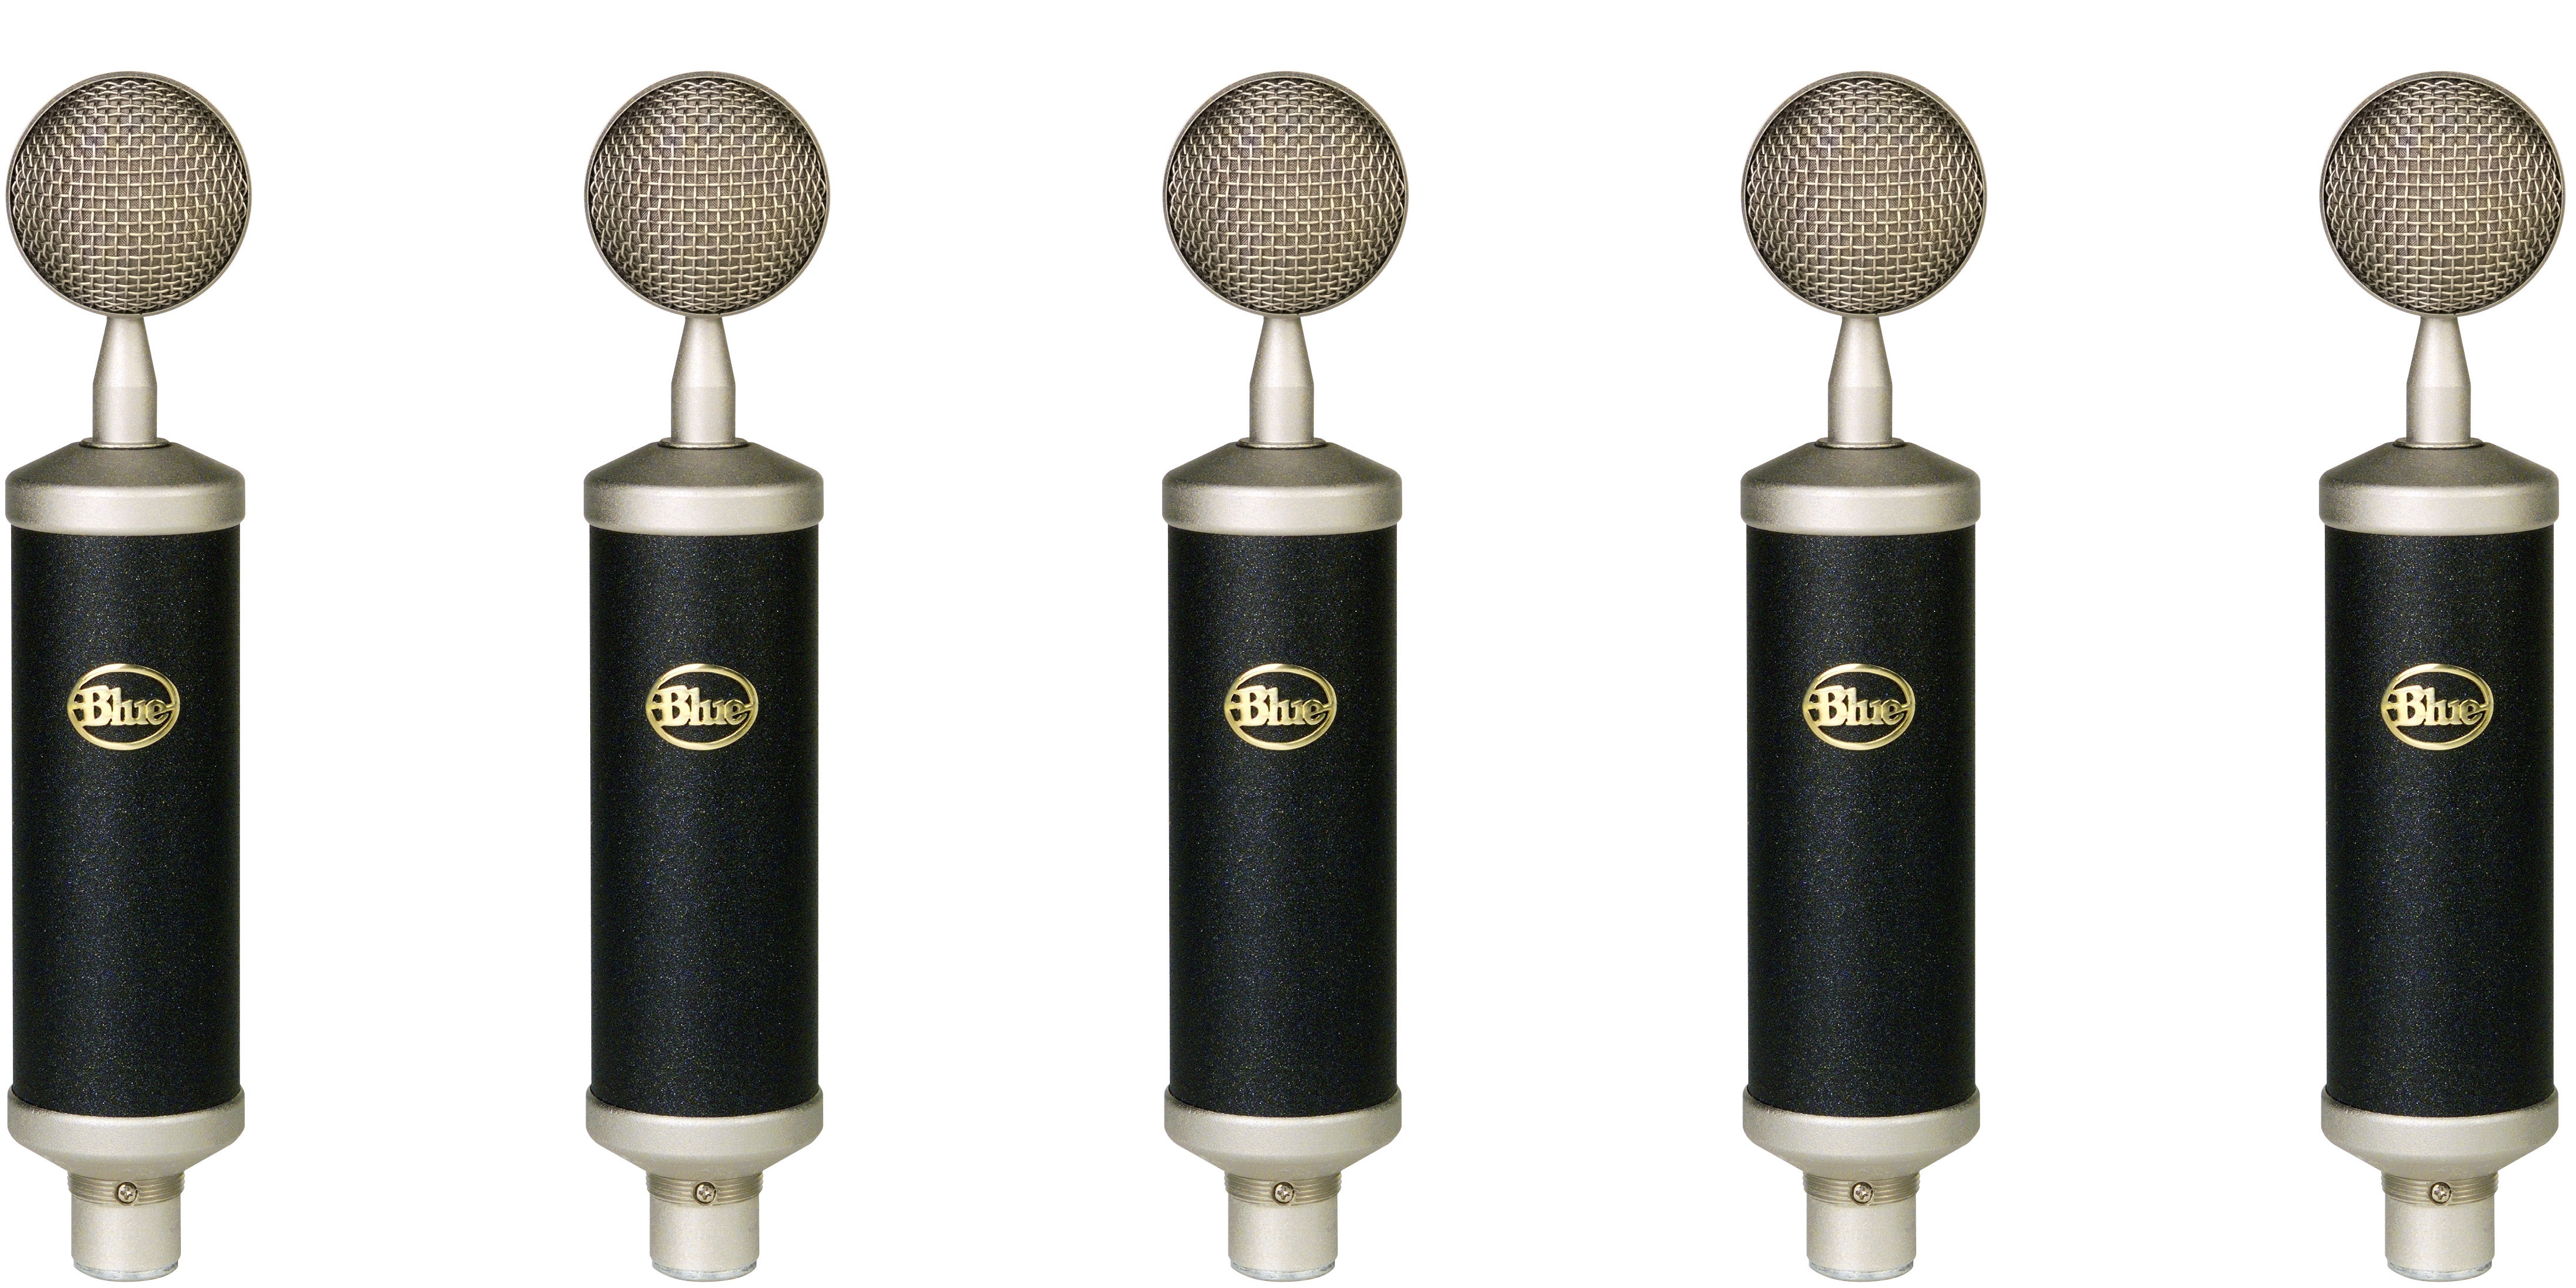 blue-microphones-baby-bottle-1